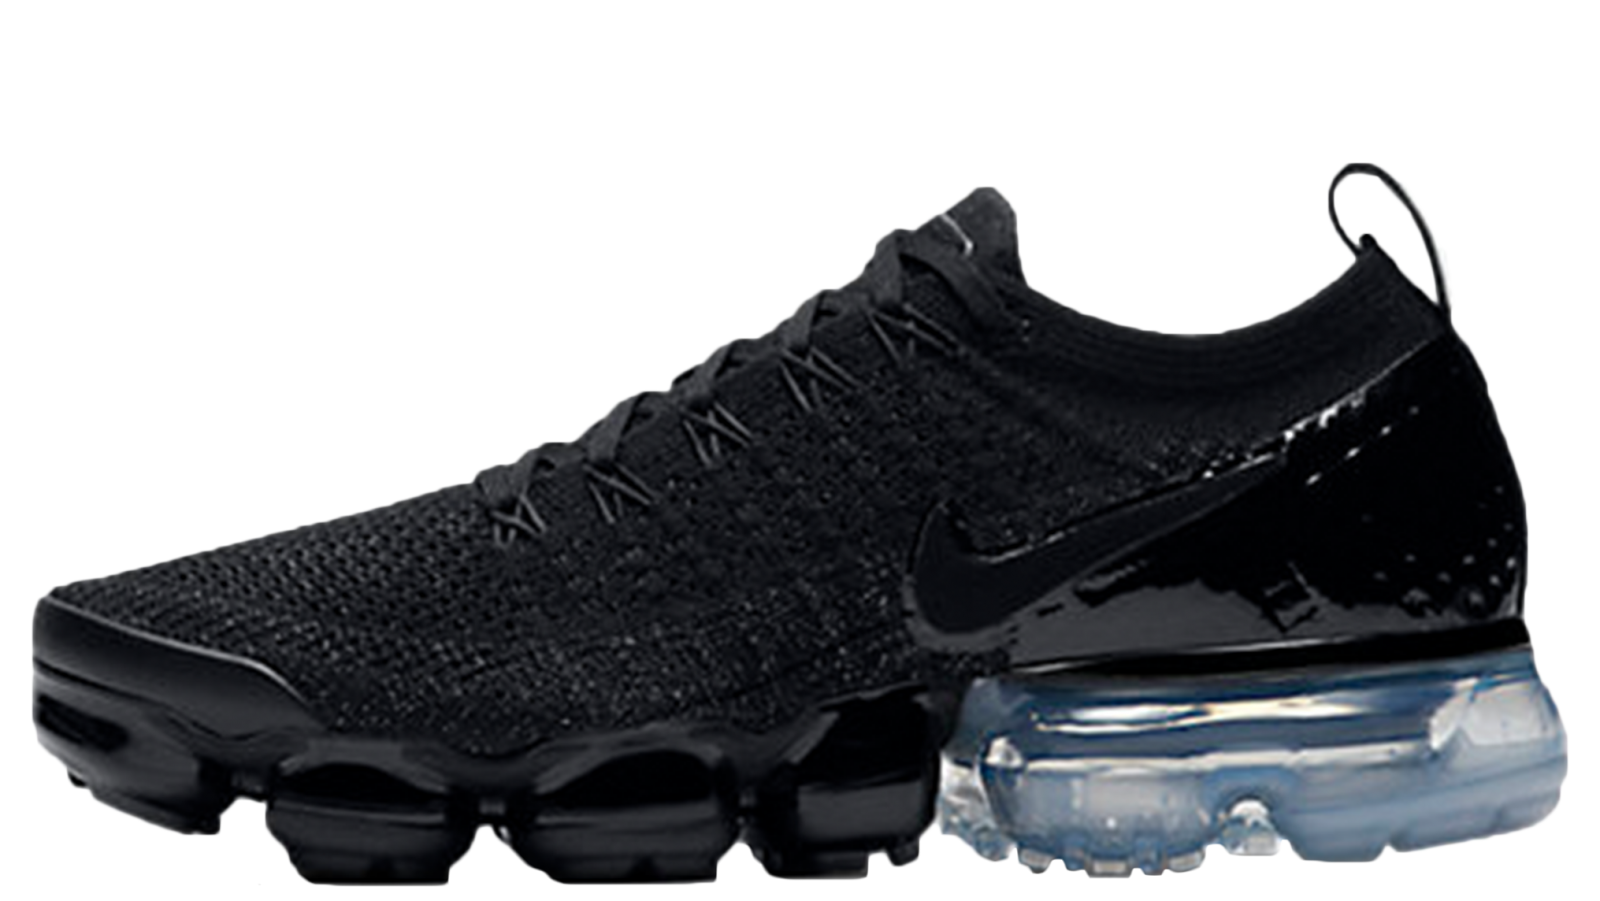 Nike Air VaporMax Flyknit 2 Black Metallic Silver | 942843-014